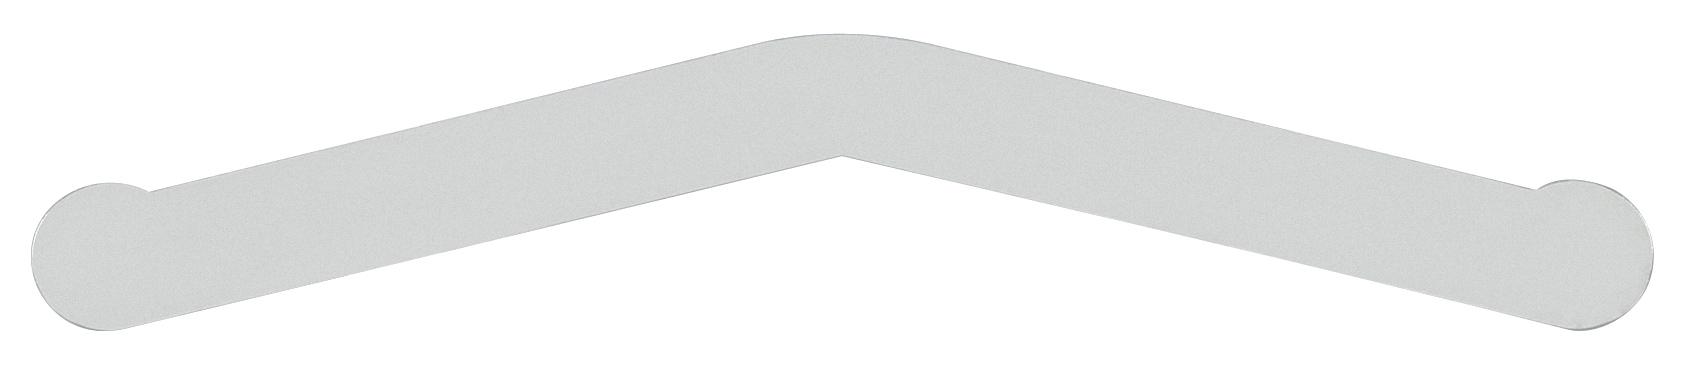 tofflemire-matrix-bands-002-13-72-47-miltex.jpg